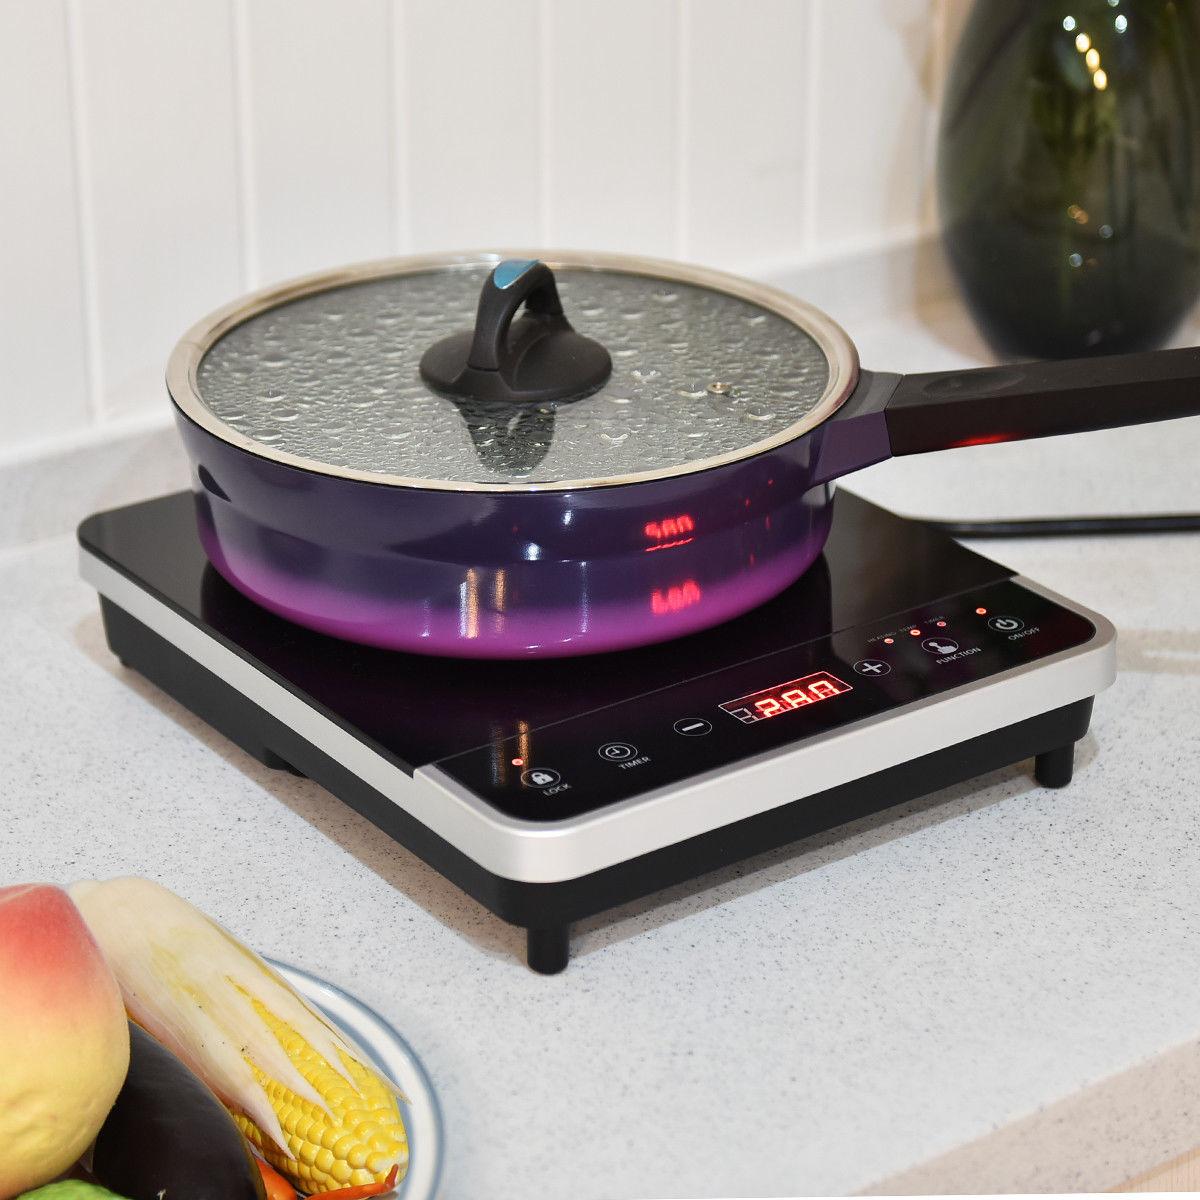 Costway Electric Induction Cooker Single Burner Digital Hot Plate Cooktop Countertop New